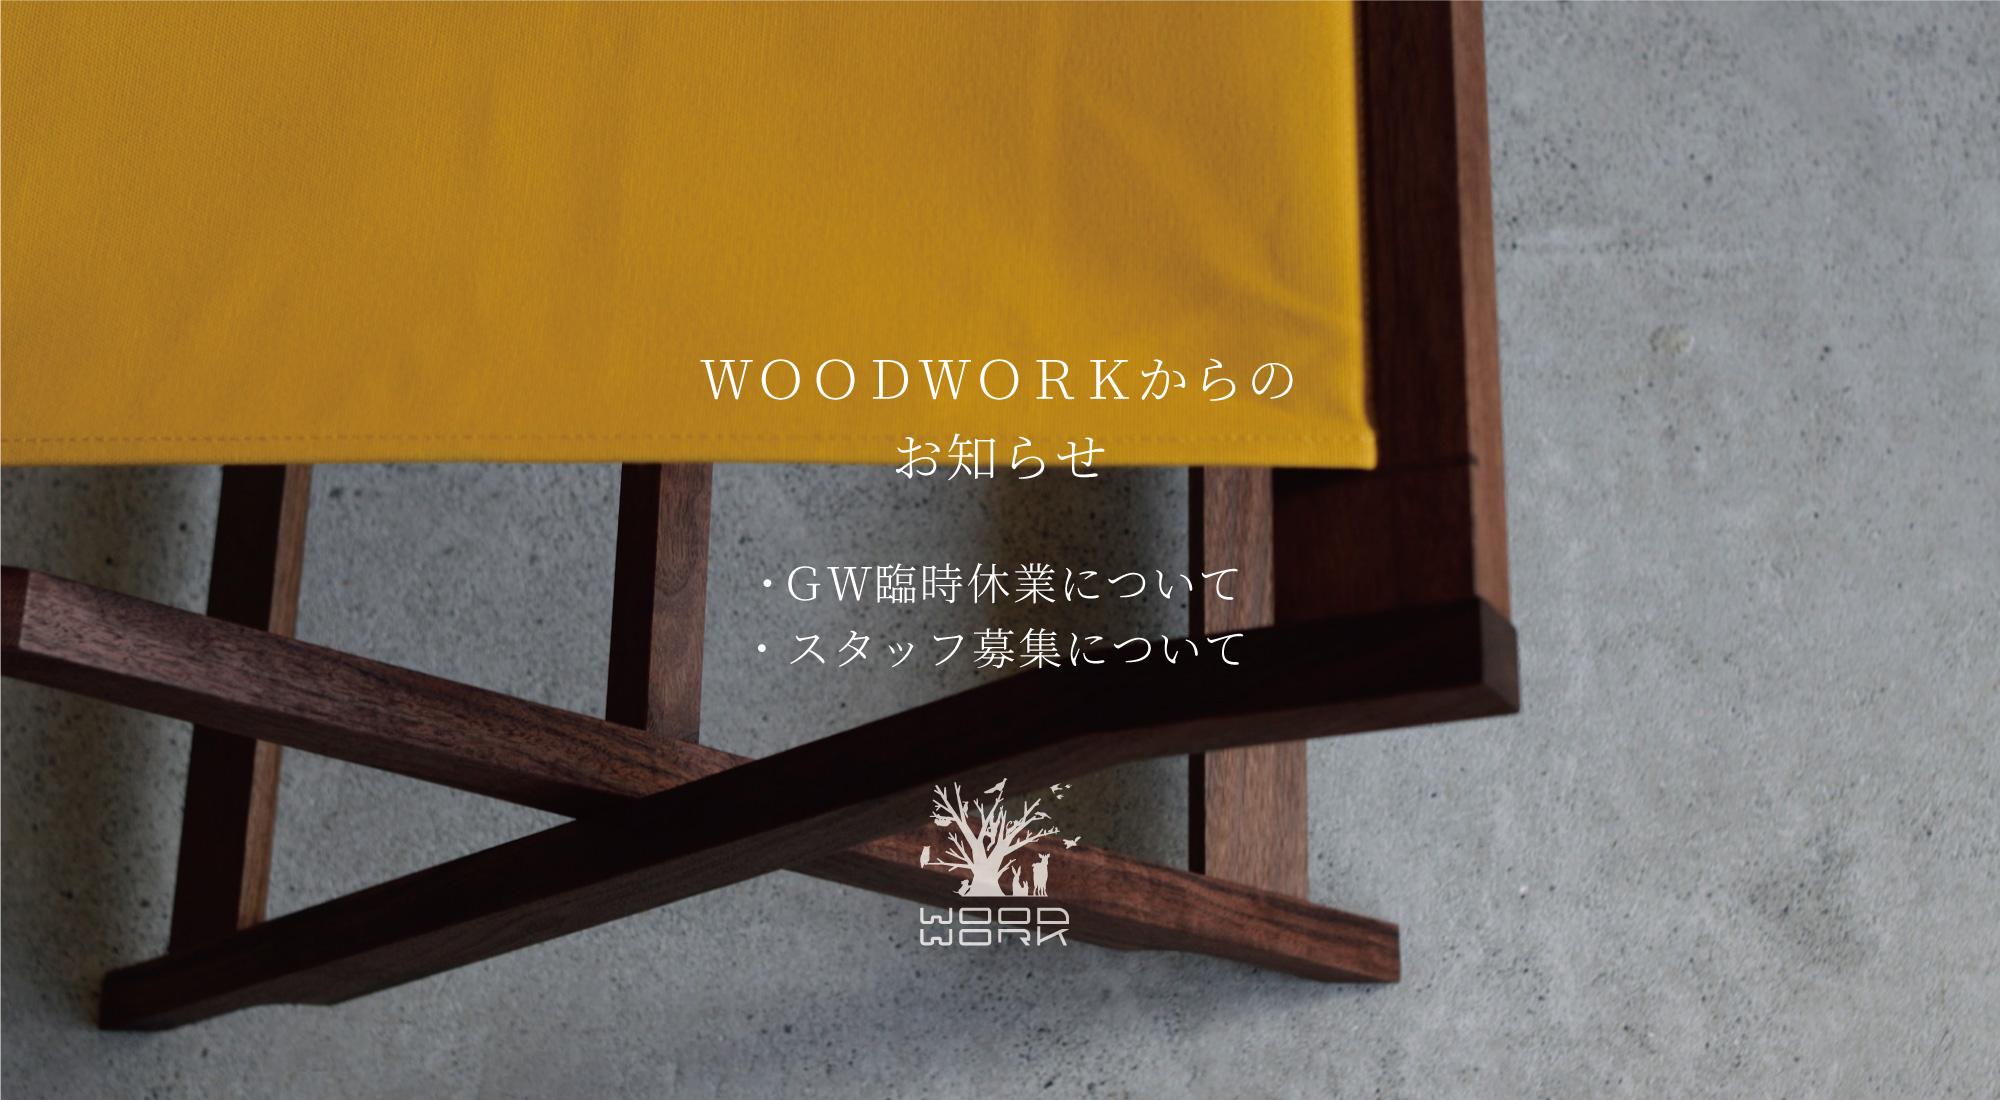 WOODWORKからのお知らせ